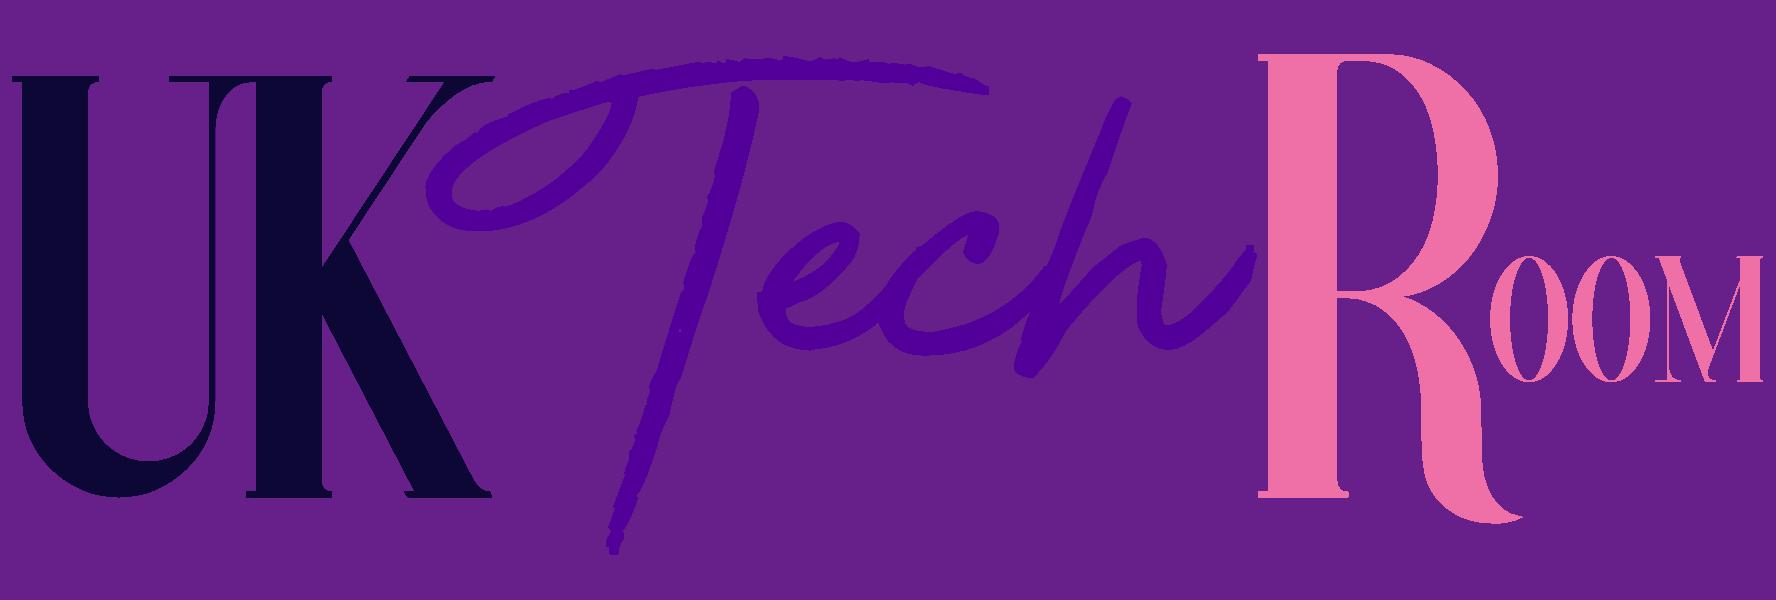 uktechroom.com